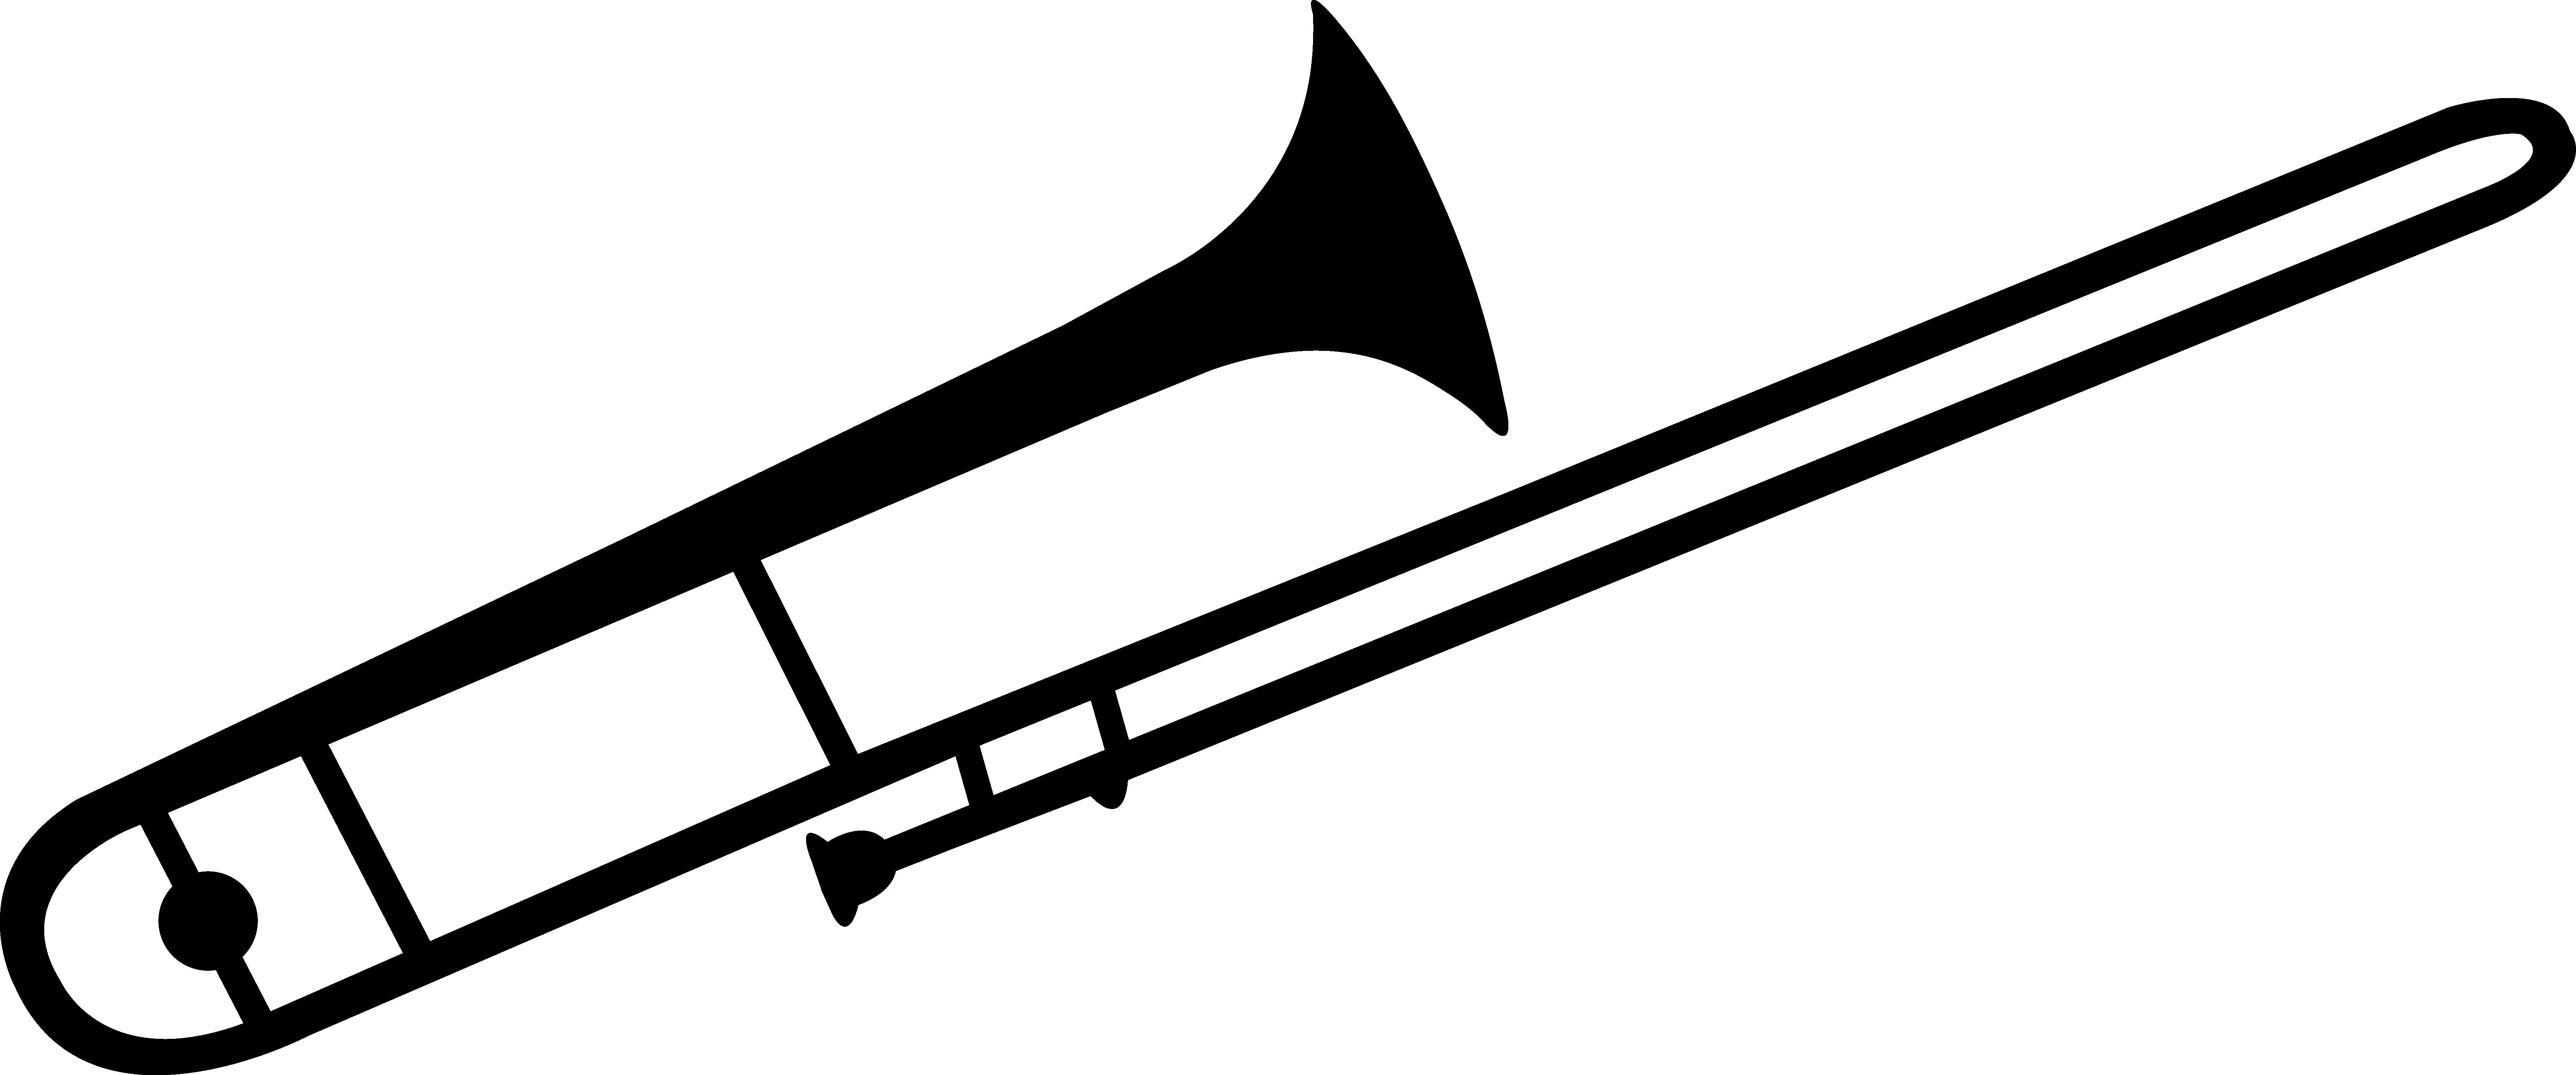 Black Trombone Silhouette.